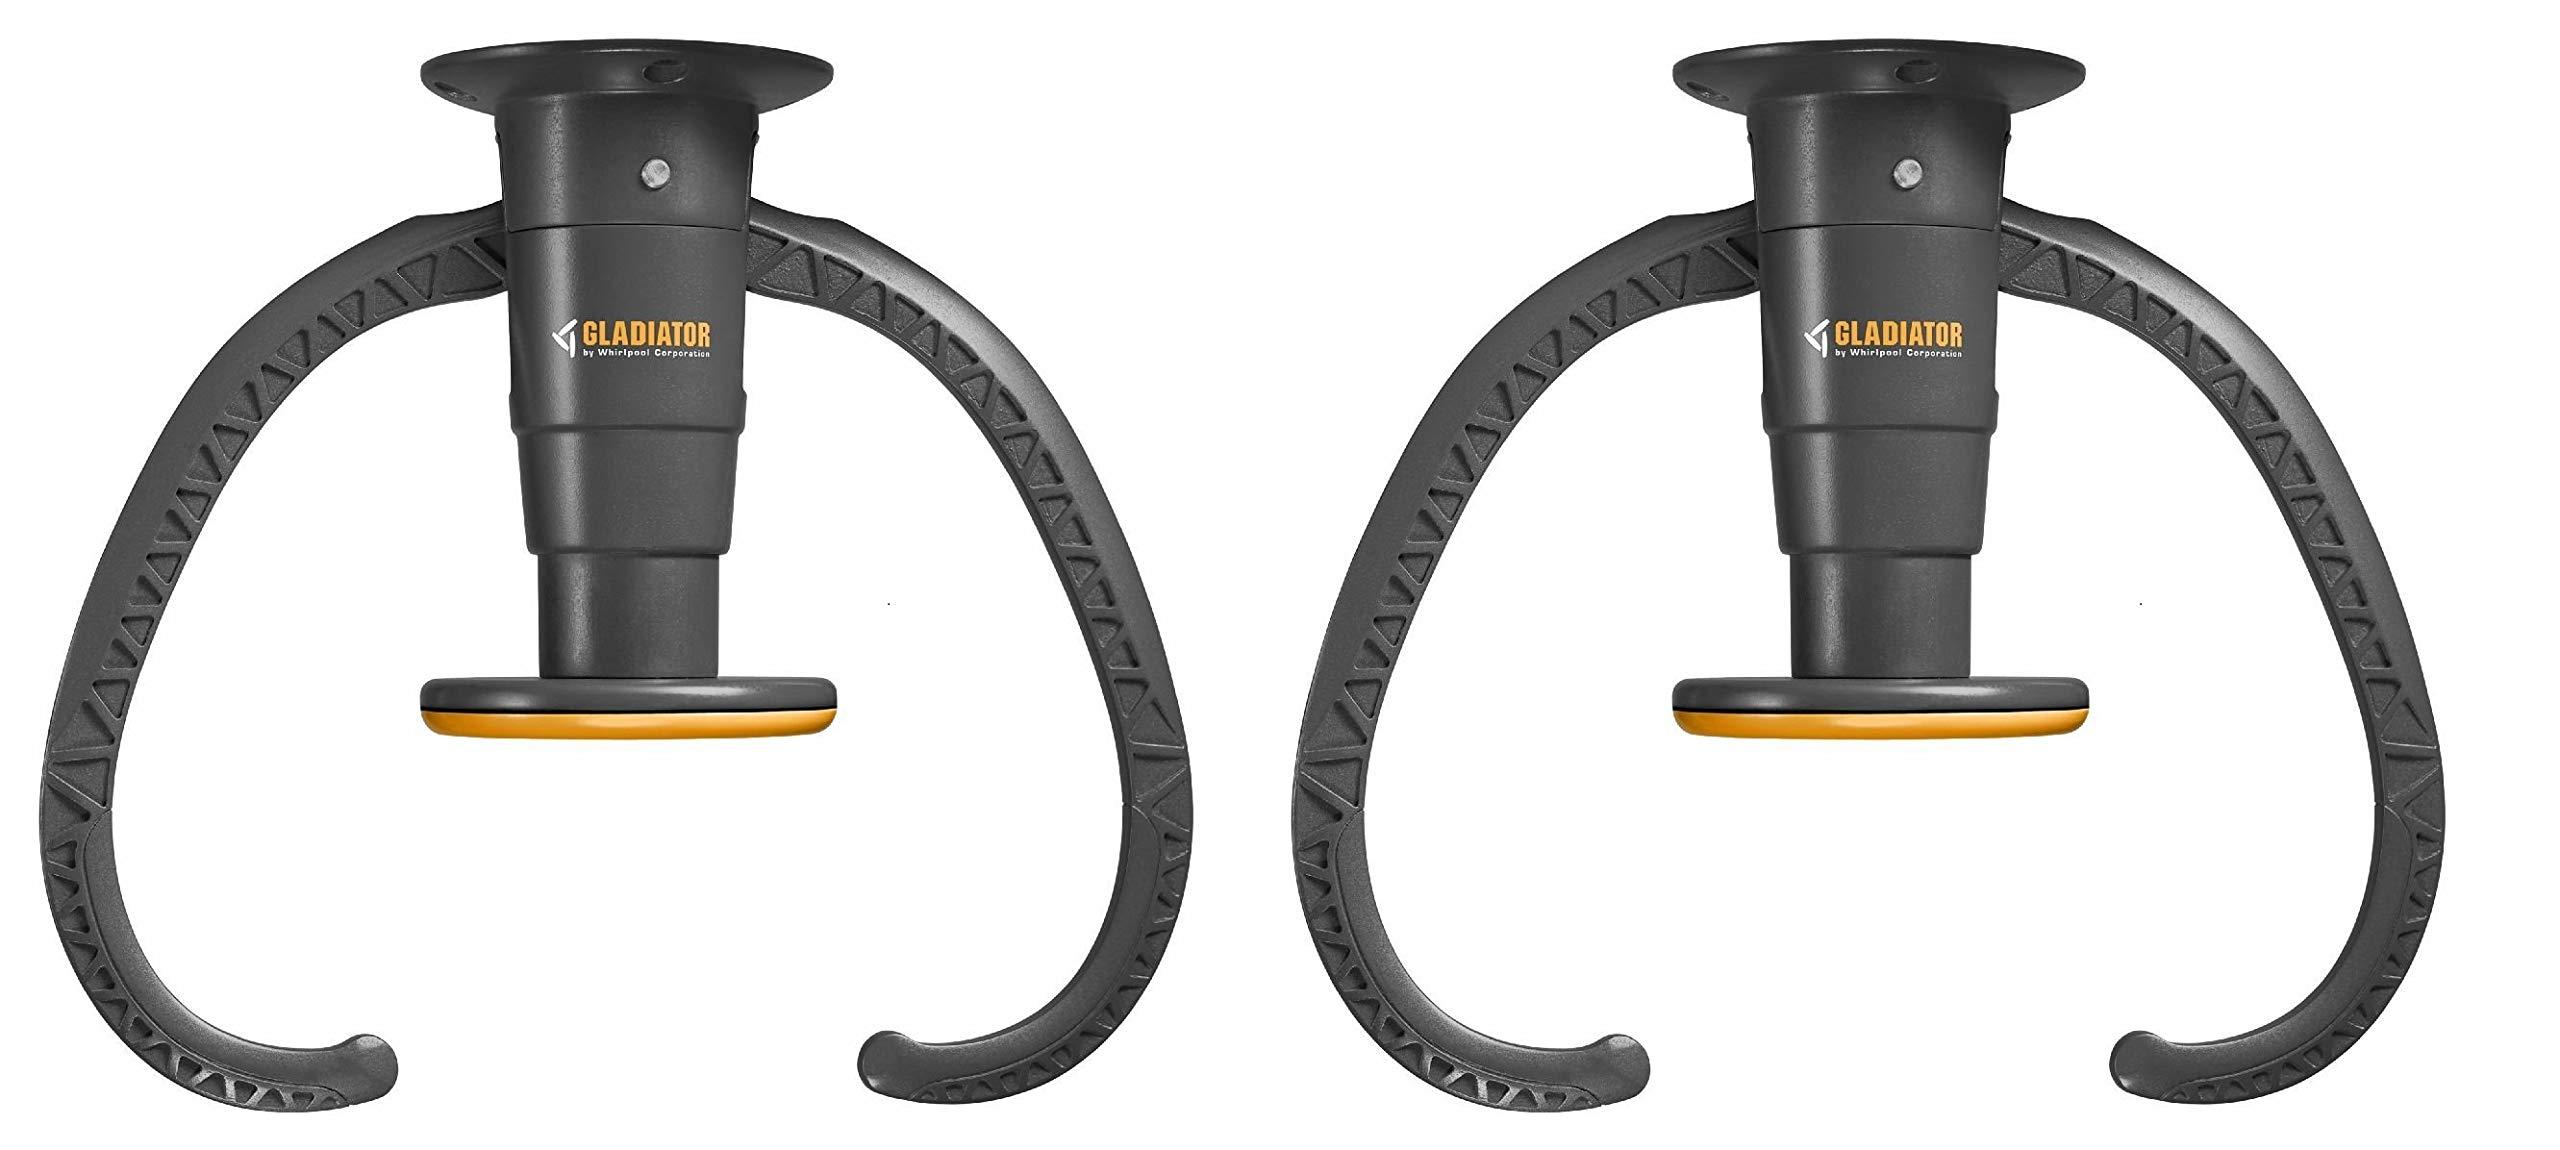 Gladiator GarageWorks GACEXXCPVK Claw Advanced Bike Storage v2.0, Plastic (Pack of 2)